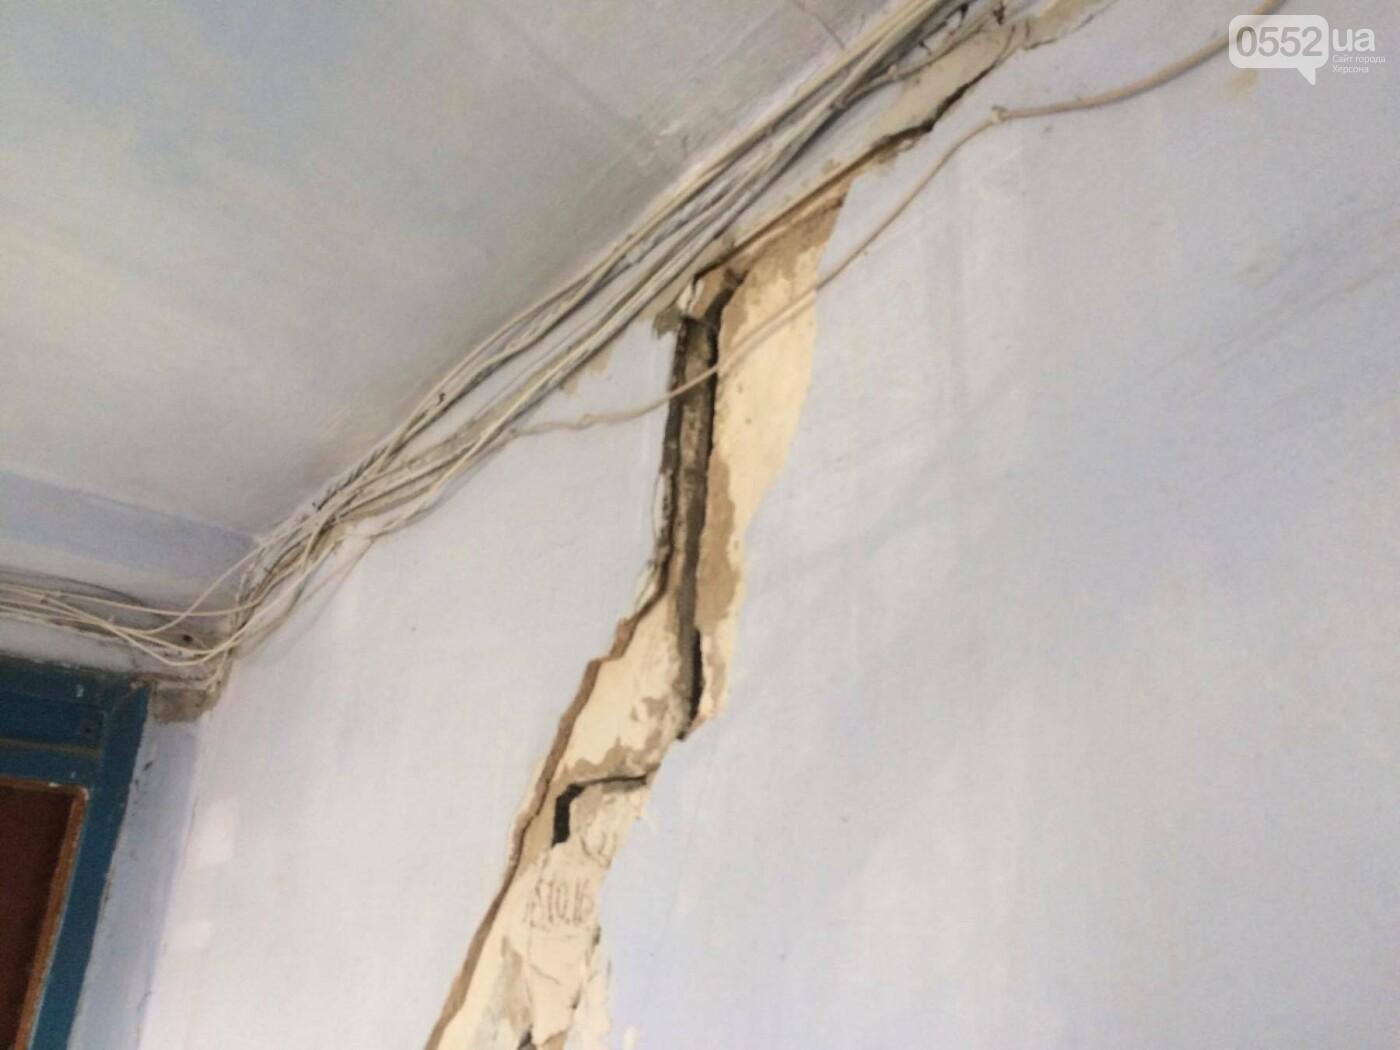 В Херсоне глава ОГА встретился с жильцами аварийного дома, фото-1